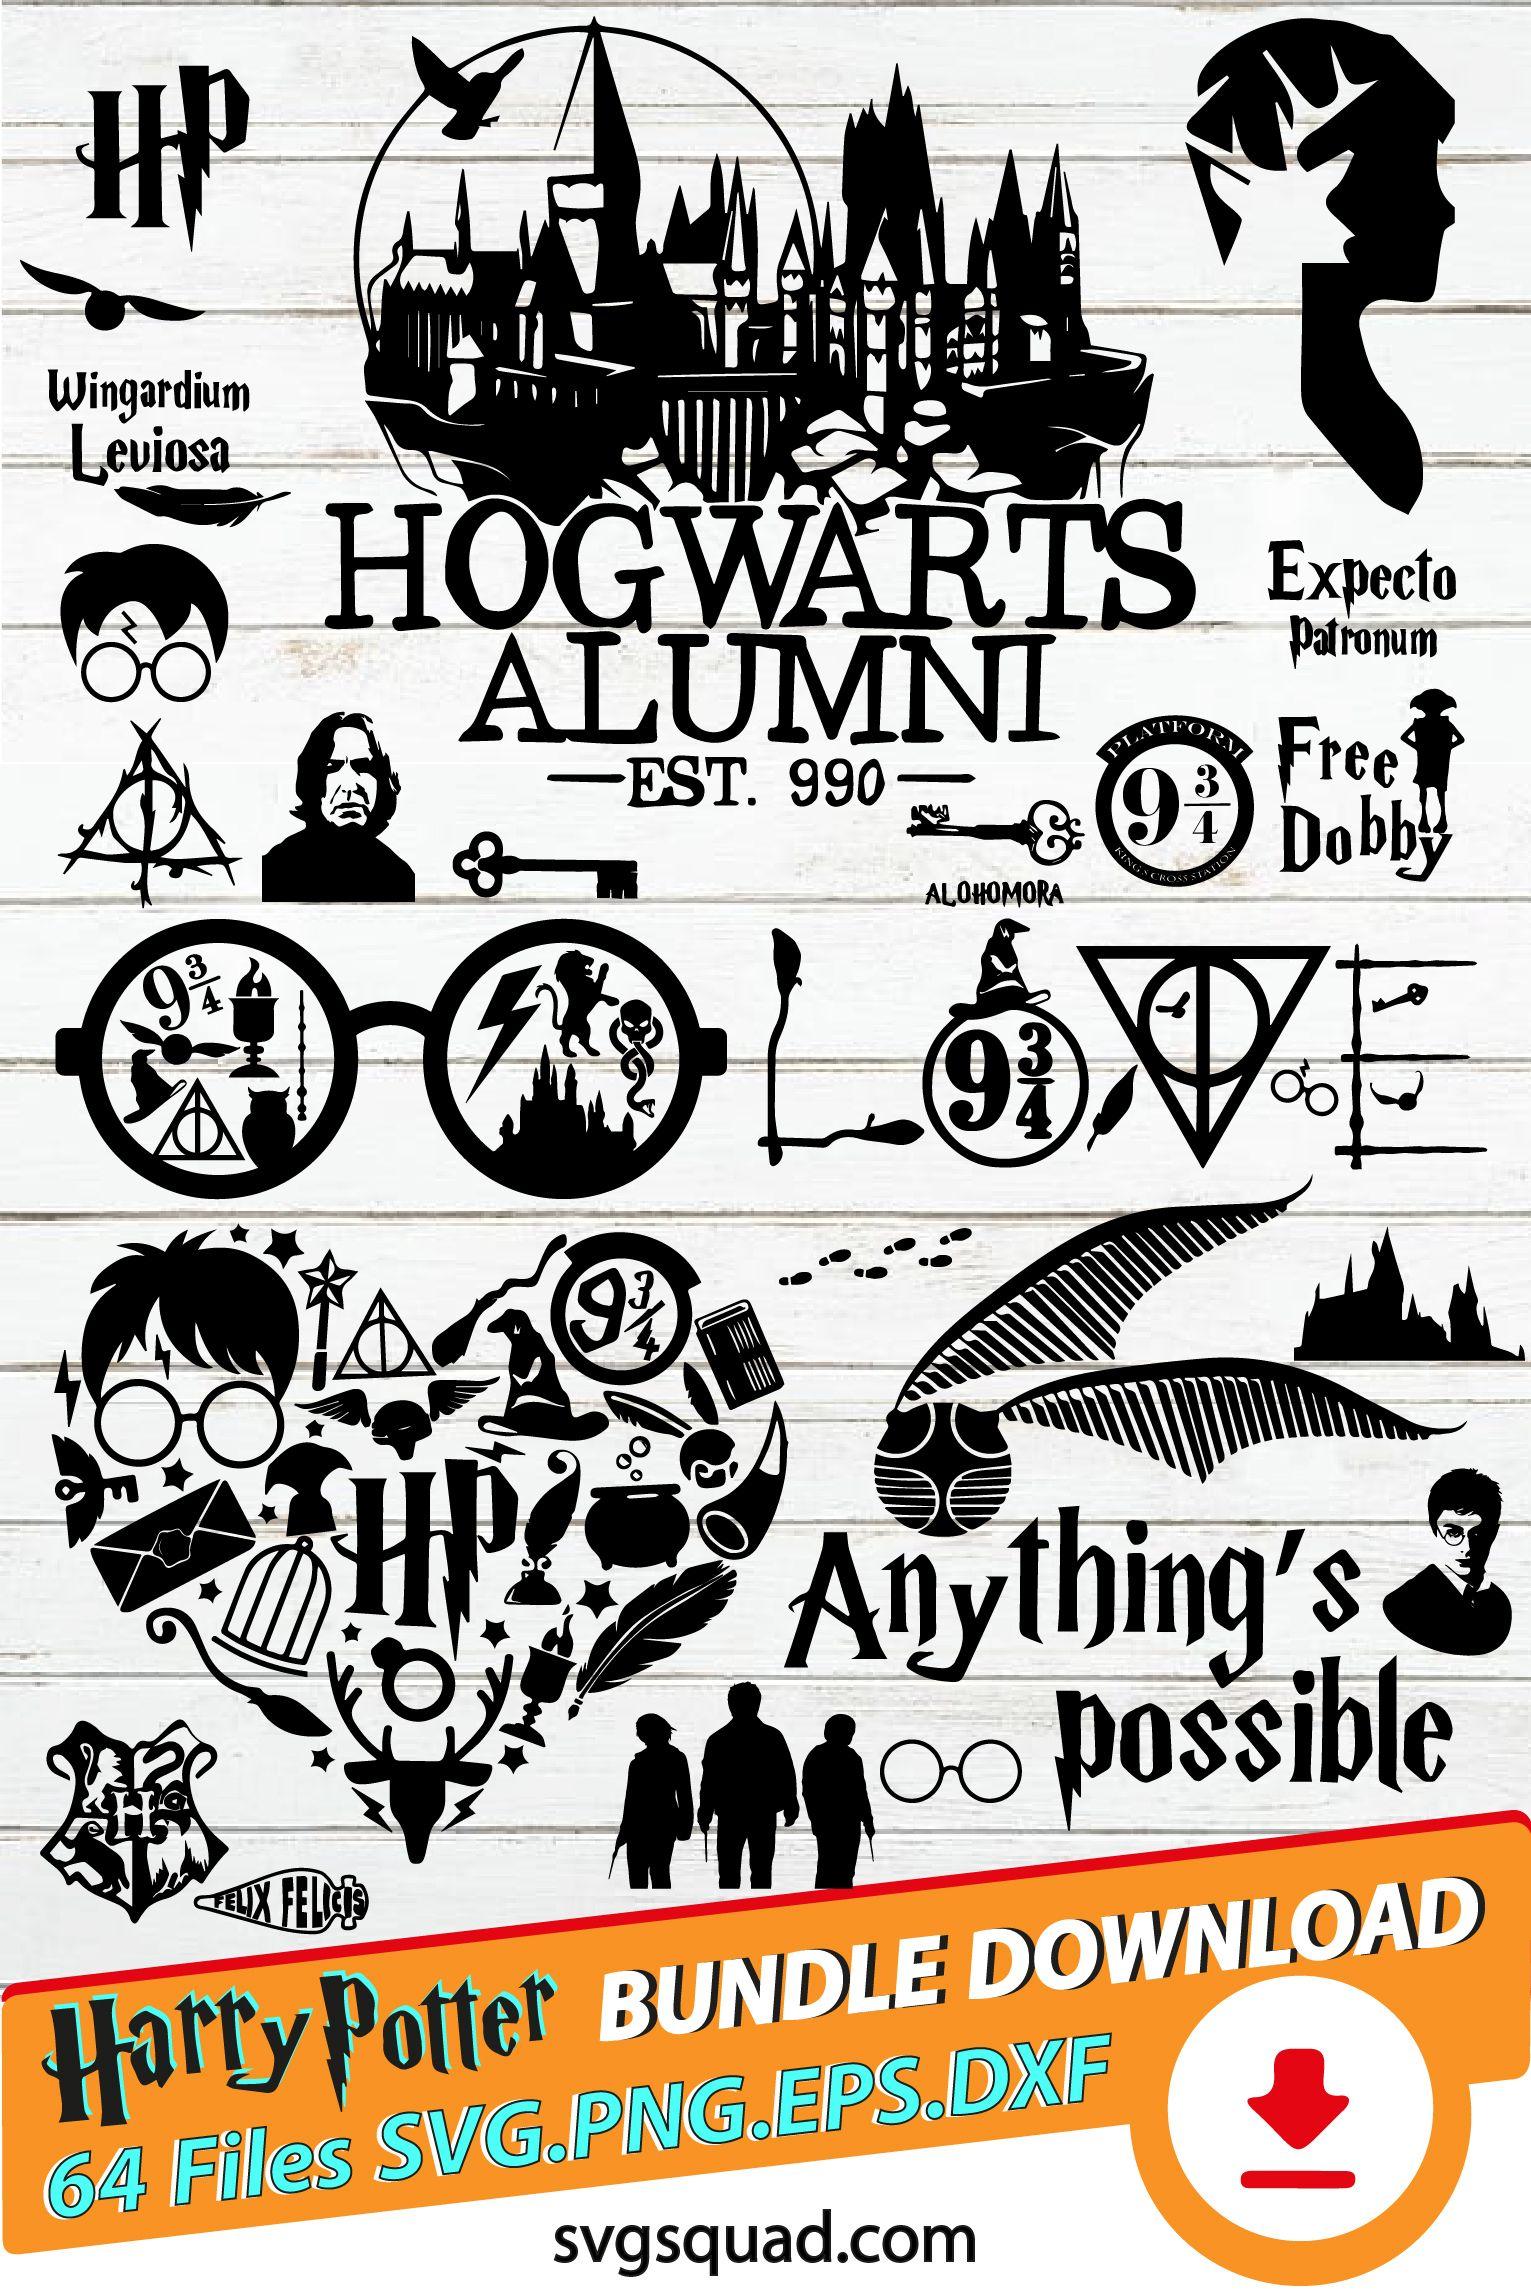 Harry Potter Svg Bundle Hogwarts Svg Harry Potter Png Hp Svg Harry Potter Silhouette Harry Potter Decor Harry Potter Decal